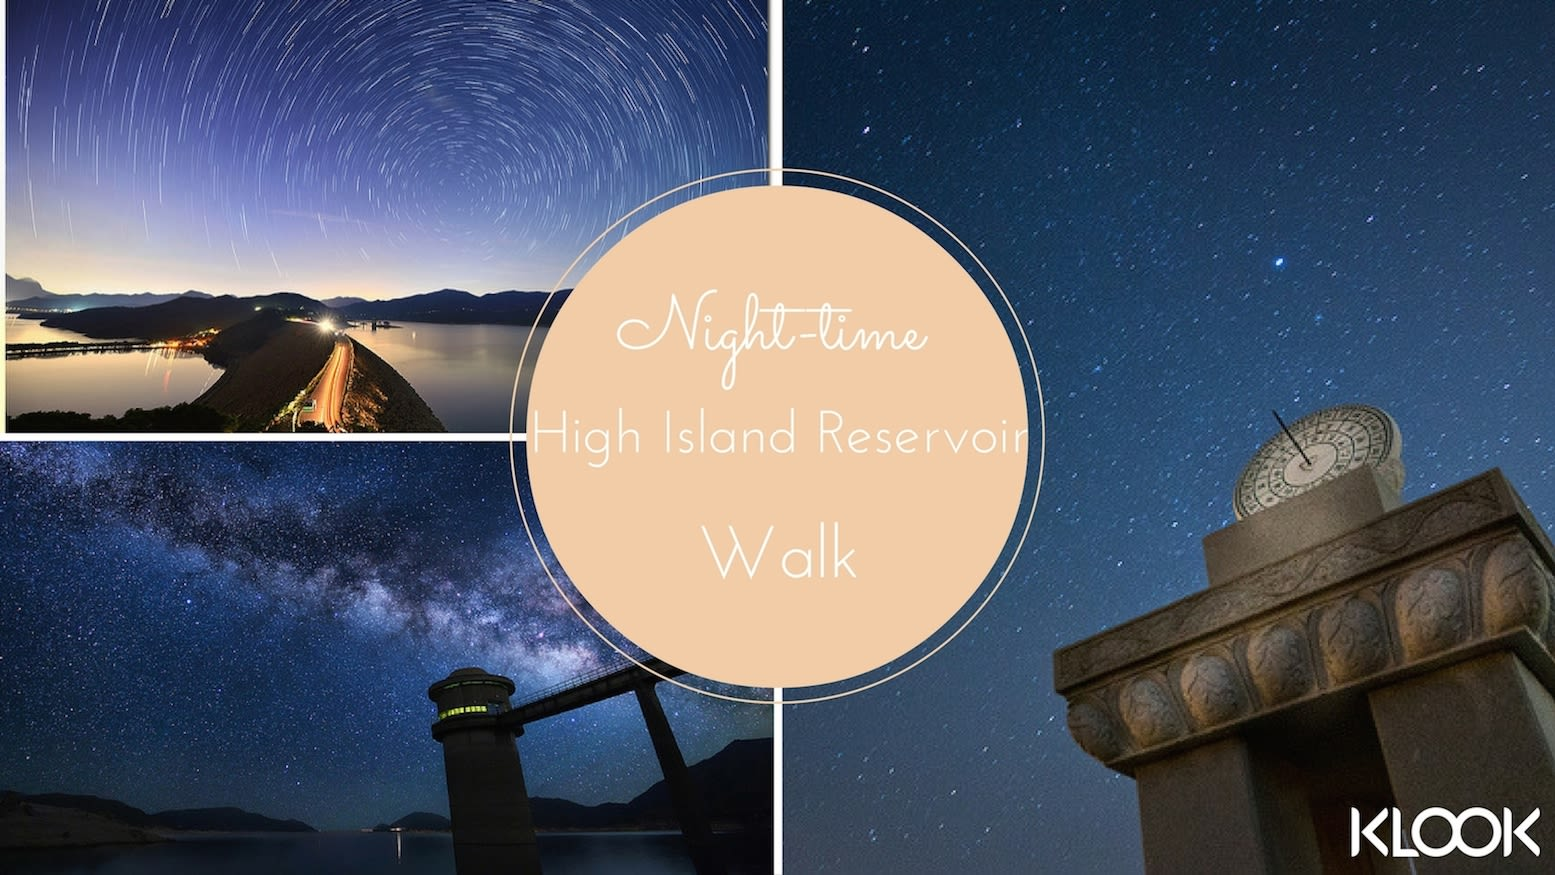 hiking, hiking trail, hiking in hong kong, hiking with lover, hiking with boyfriend, hiking with girlfriend, hiking at night, High Island Reservoir West Dam, Hong Kong Astropark, Sai Kung Astropark